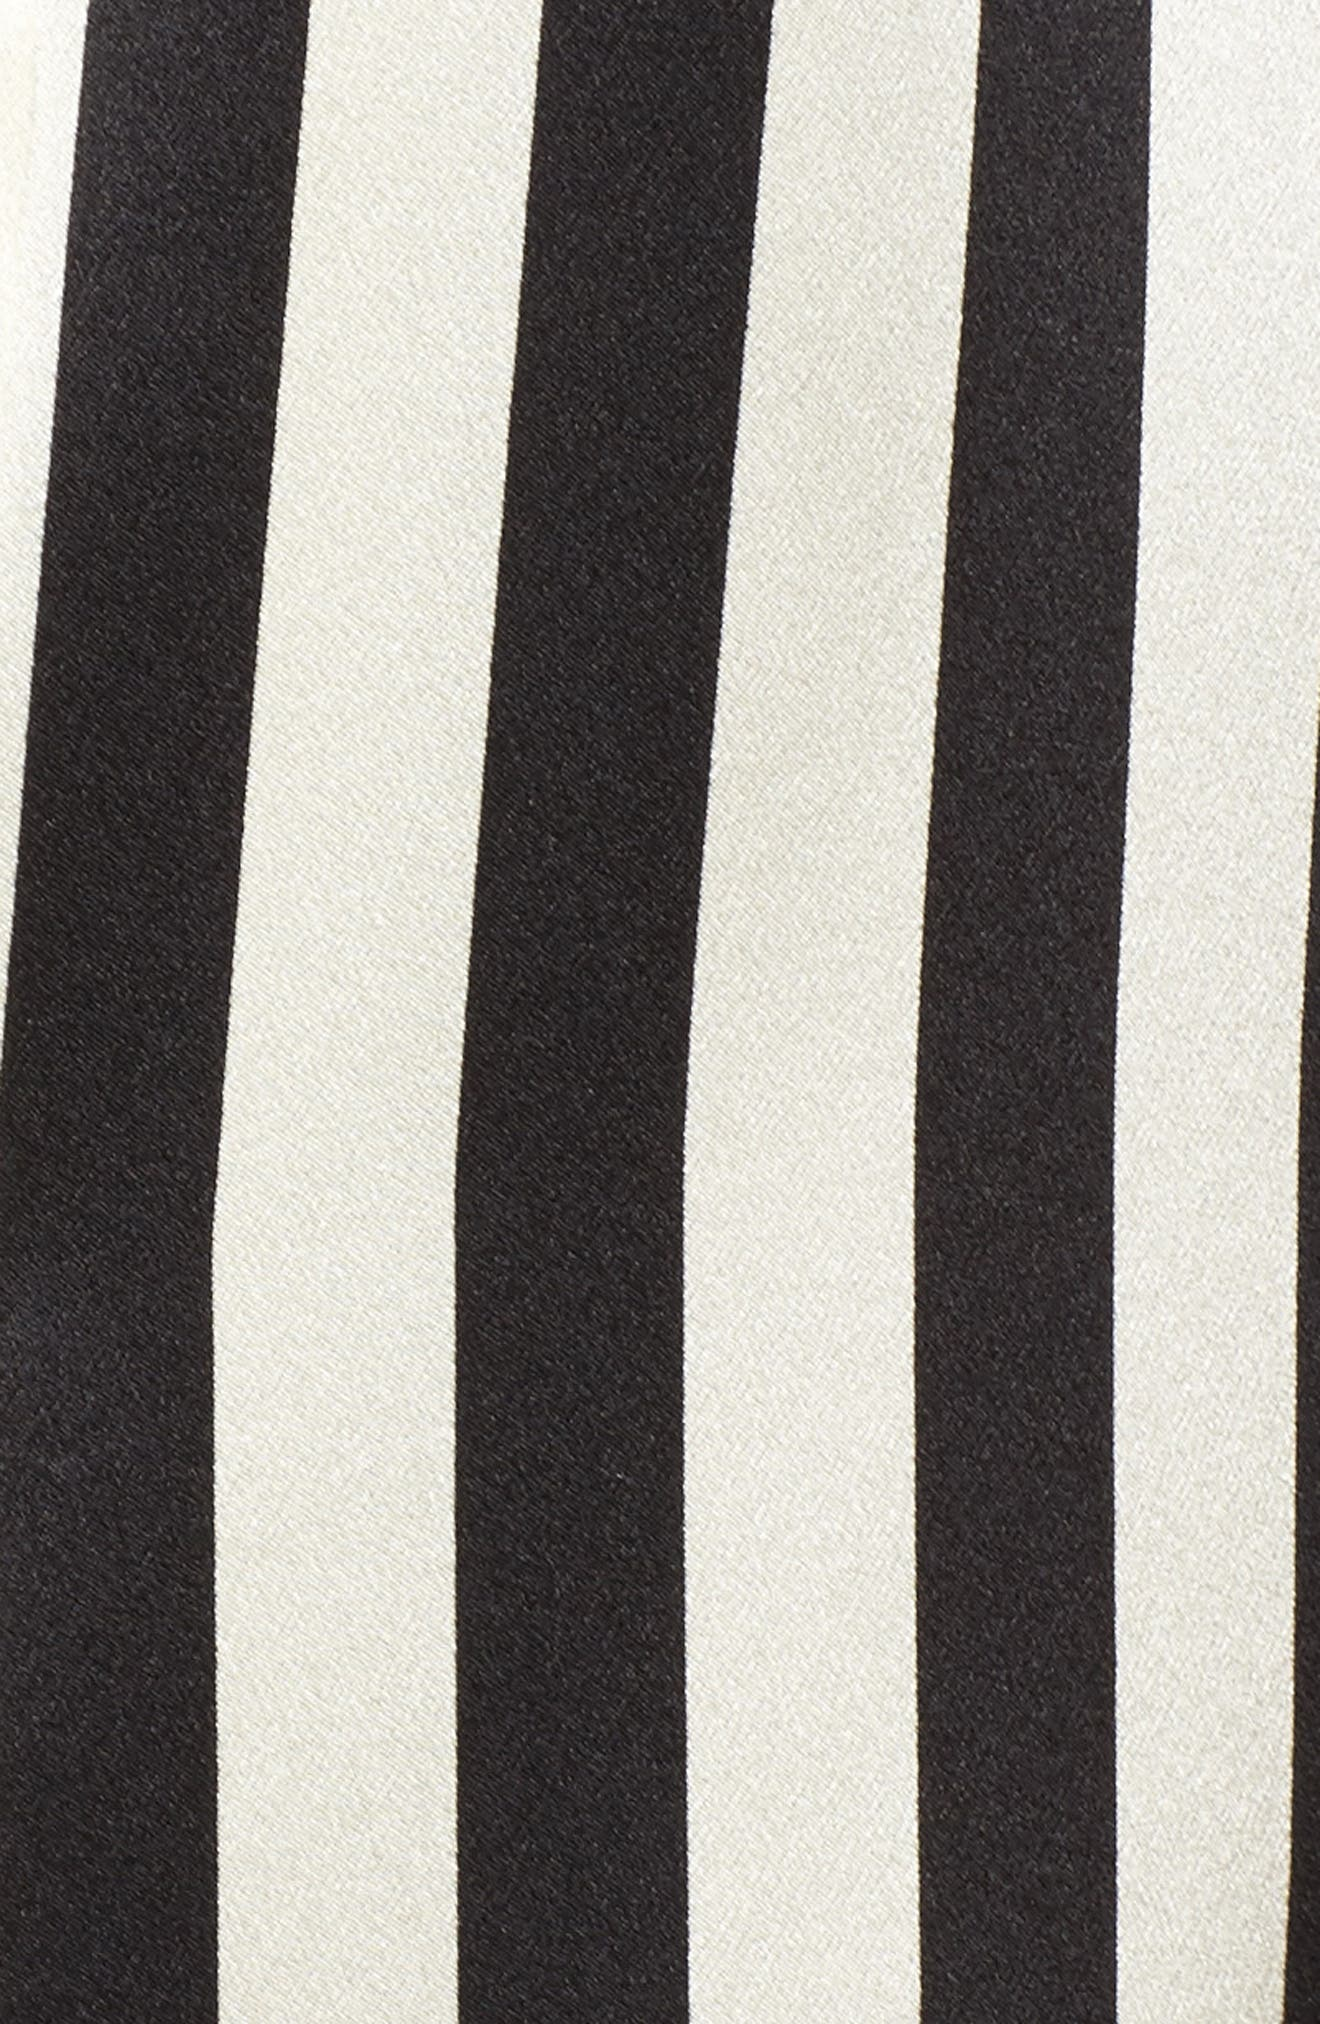 x Amanda Fatherazi Ruthie Mini Mask Stripe Pajama Top,                             Alternate thumbnail 7, color,                             Noir/ Ecru